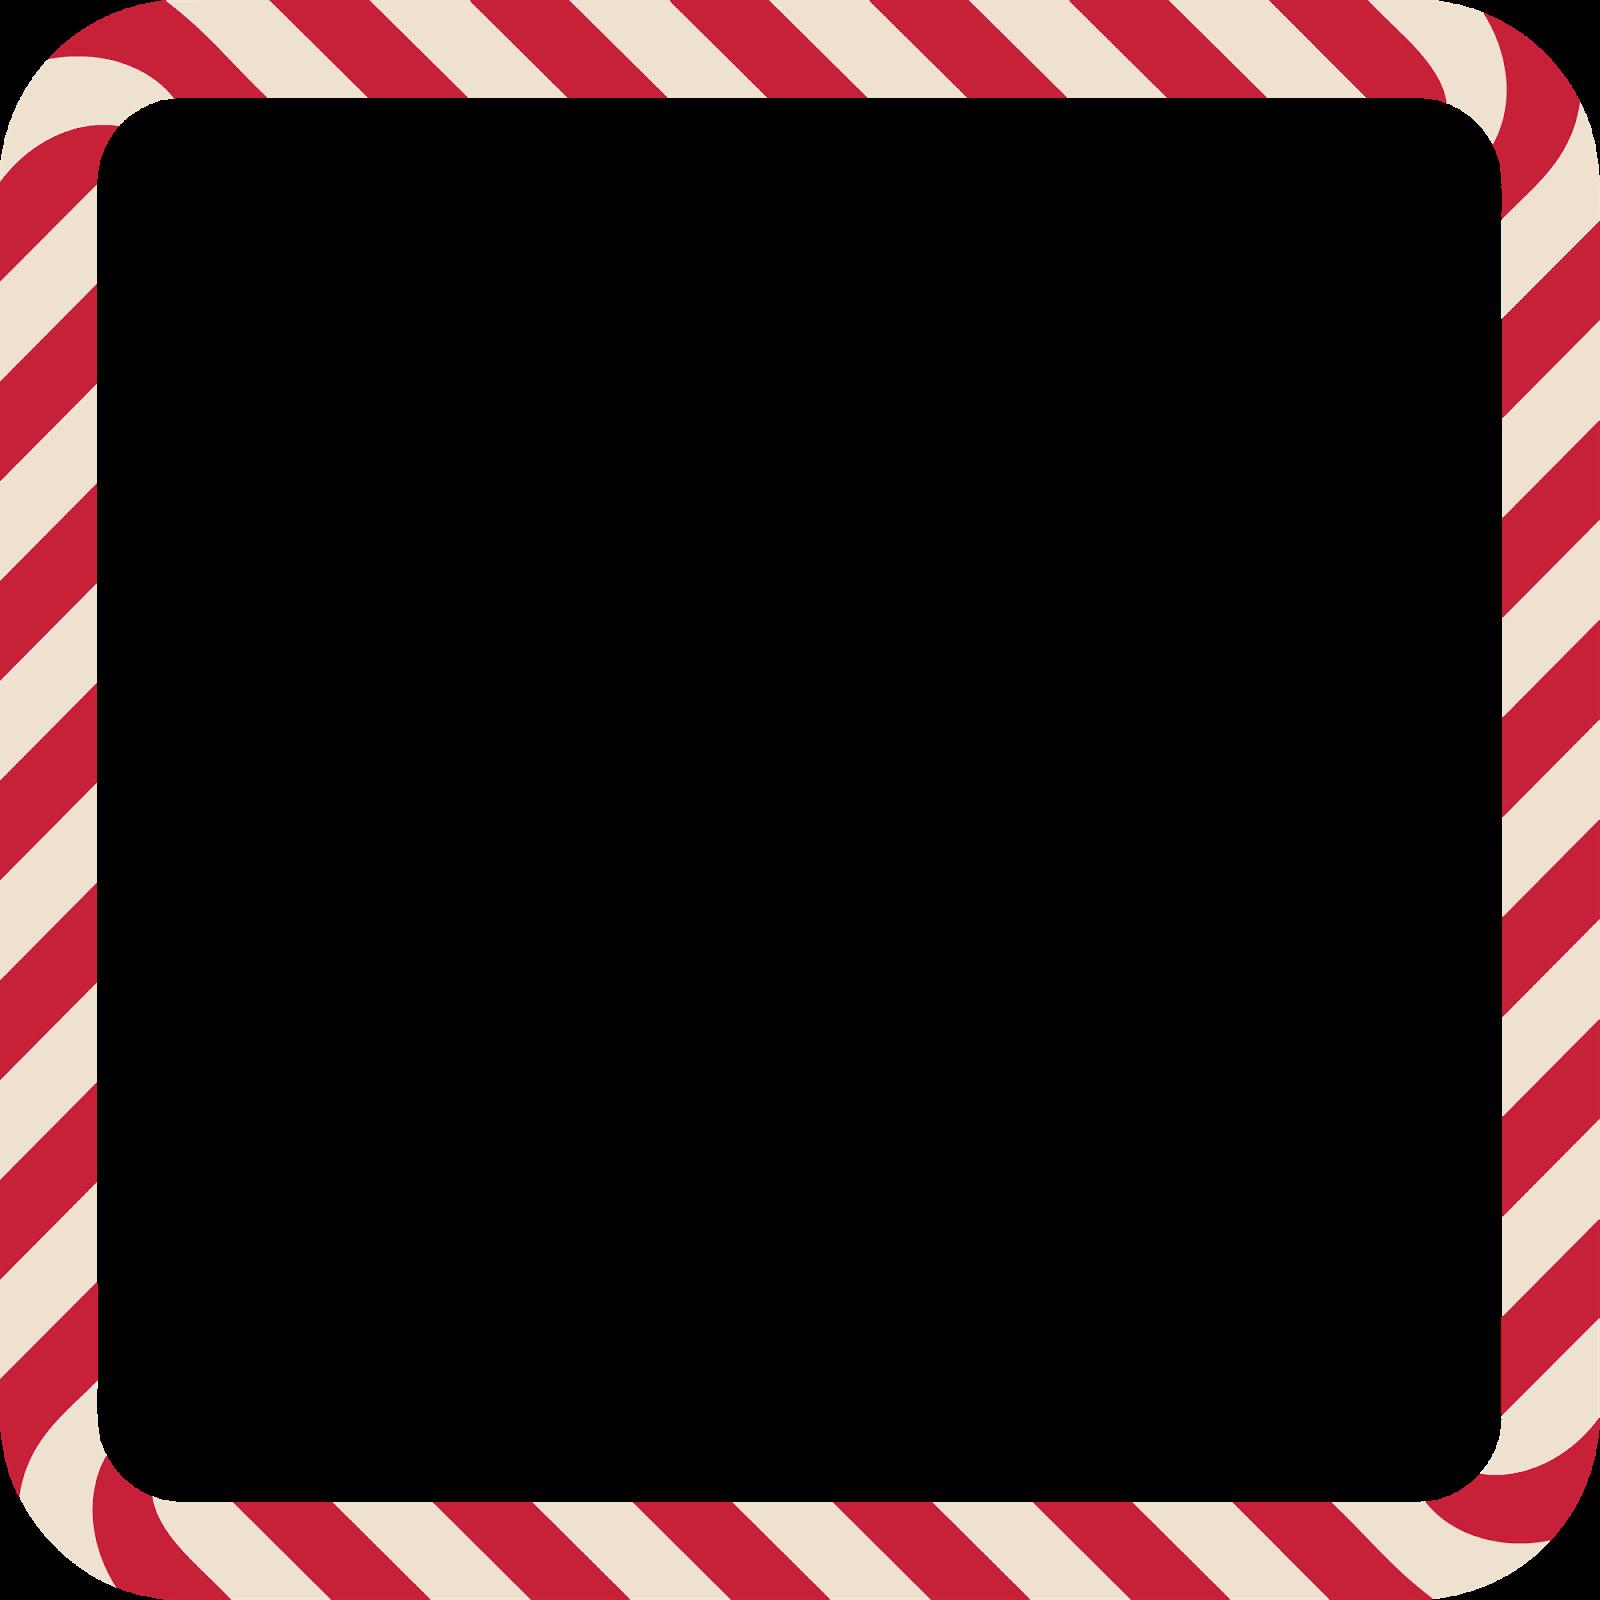 Wonderland In A Wardrobe: Candy Cane Frames Freebies! | Vector ...